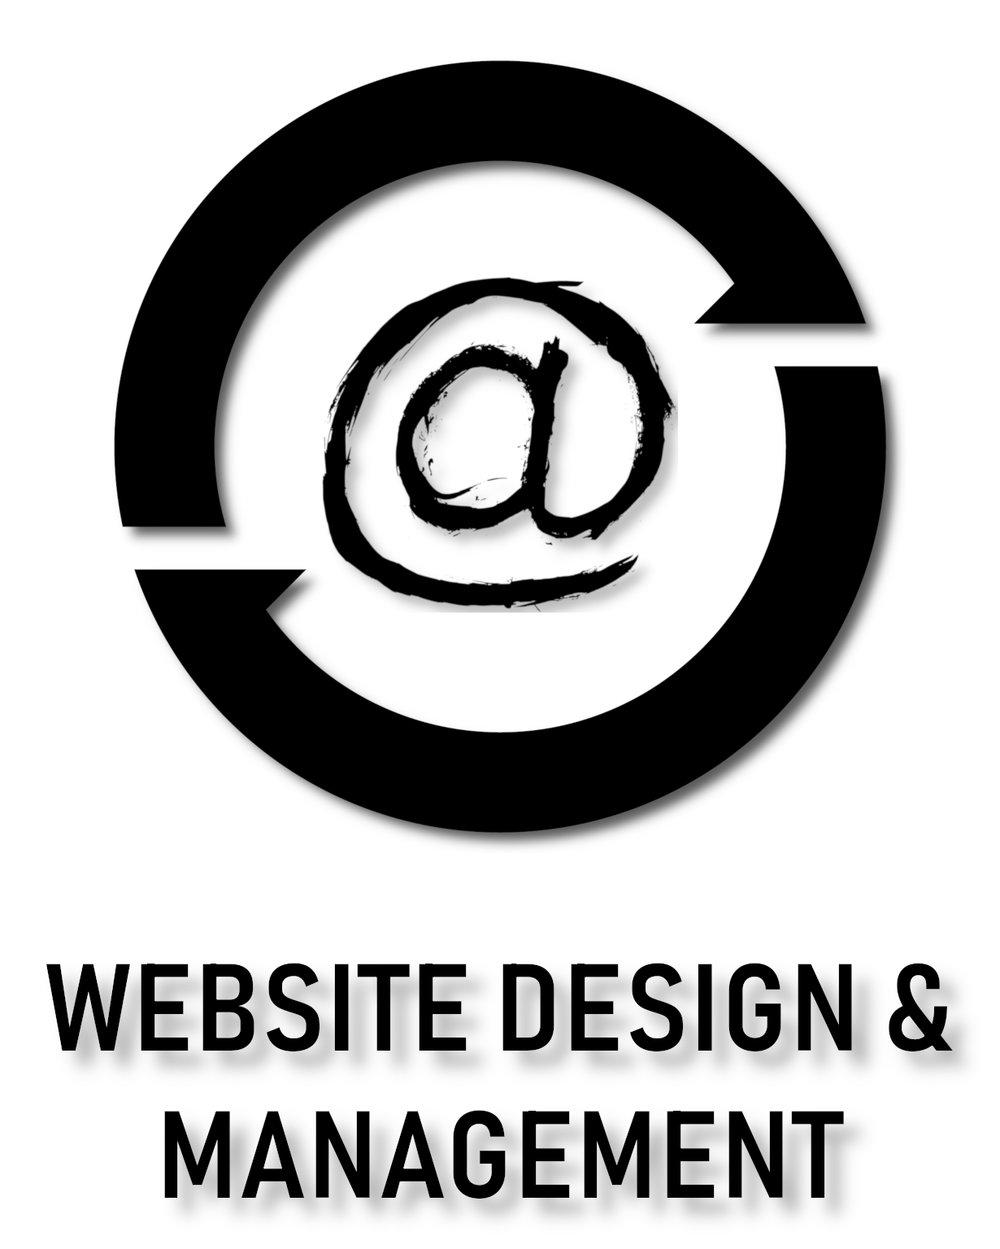 Flipped Vermont Technology Solutions - Website Design & Management